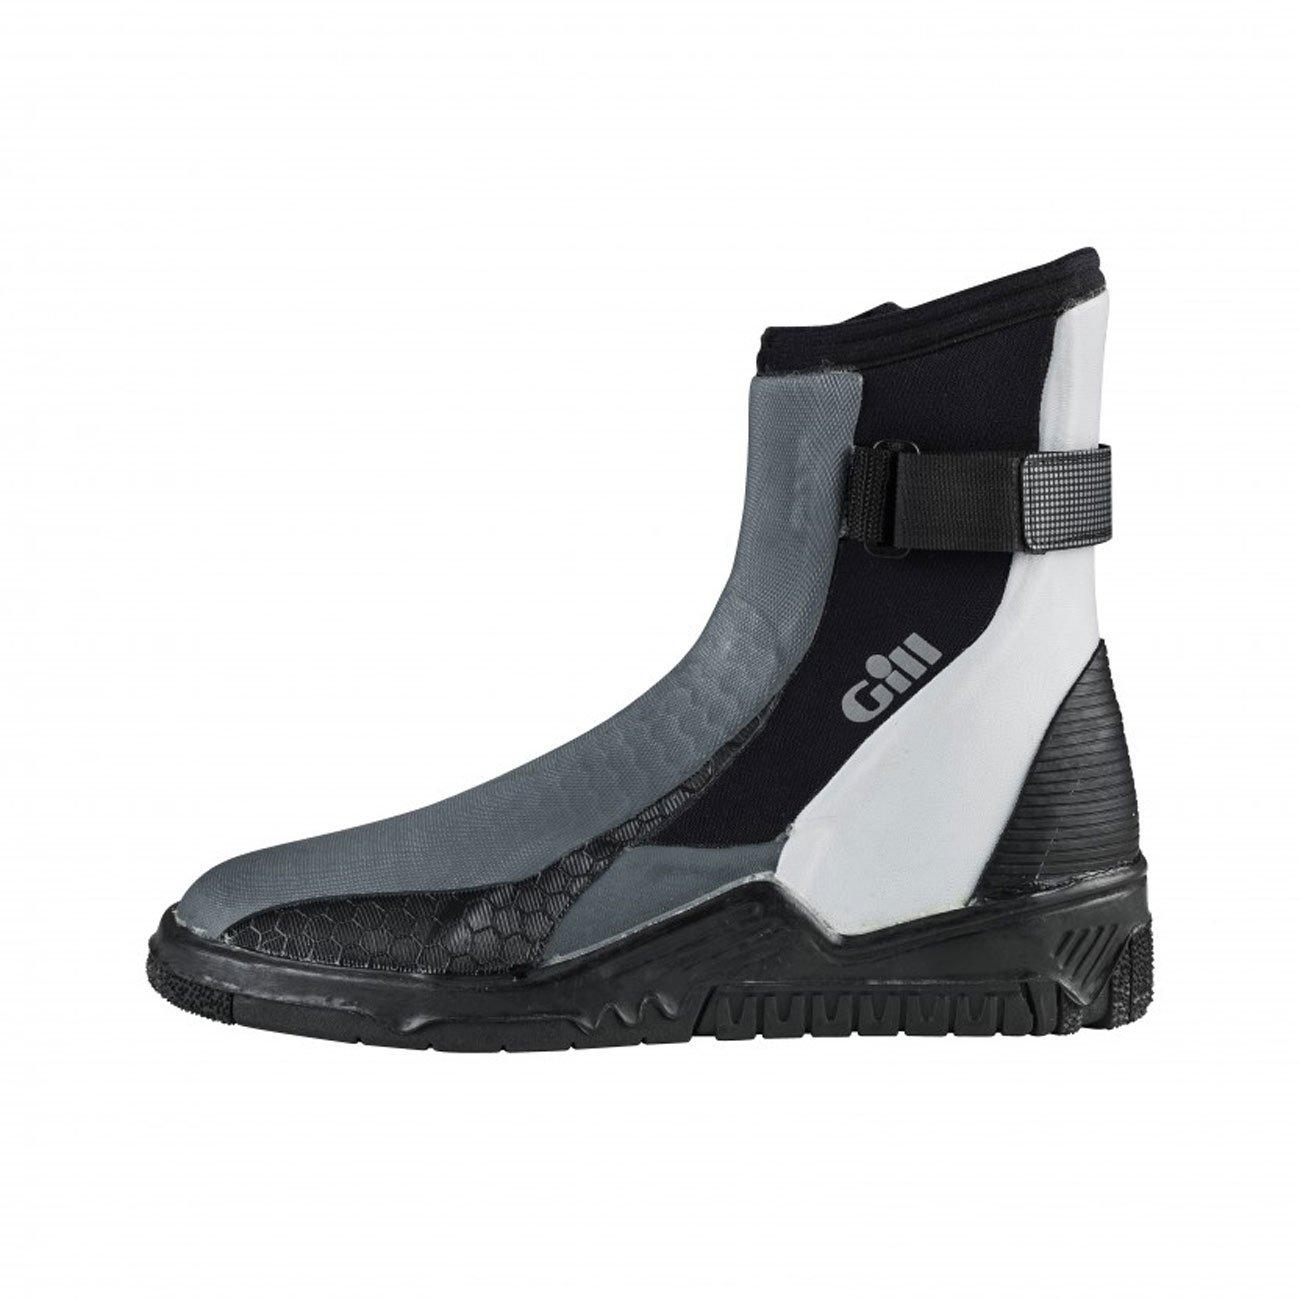 Gill 5mm Black 906Sportamp; 2016 Hiking Silver Boots Freizeit rCxodBe